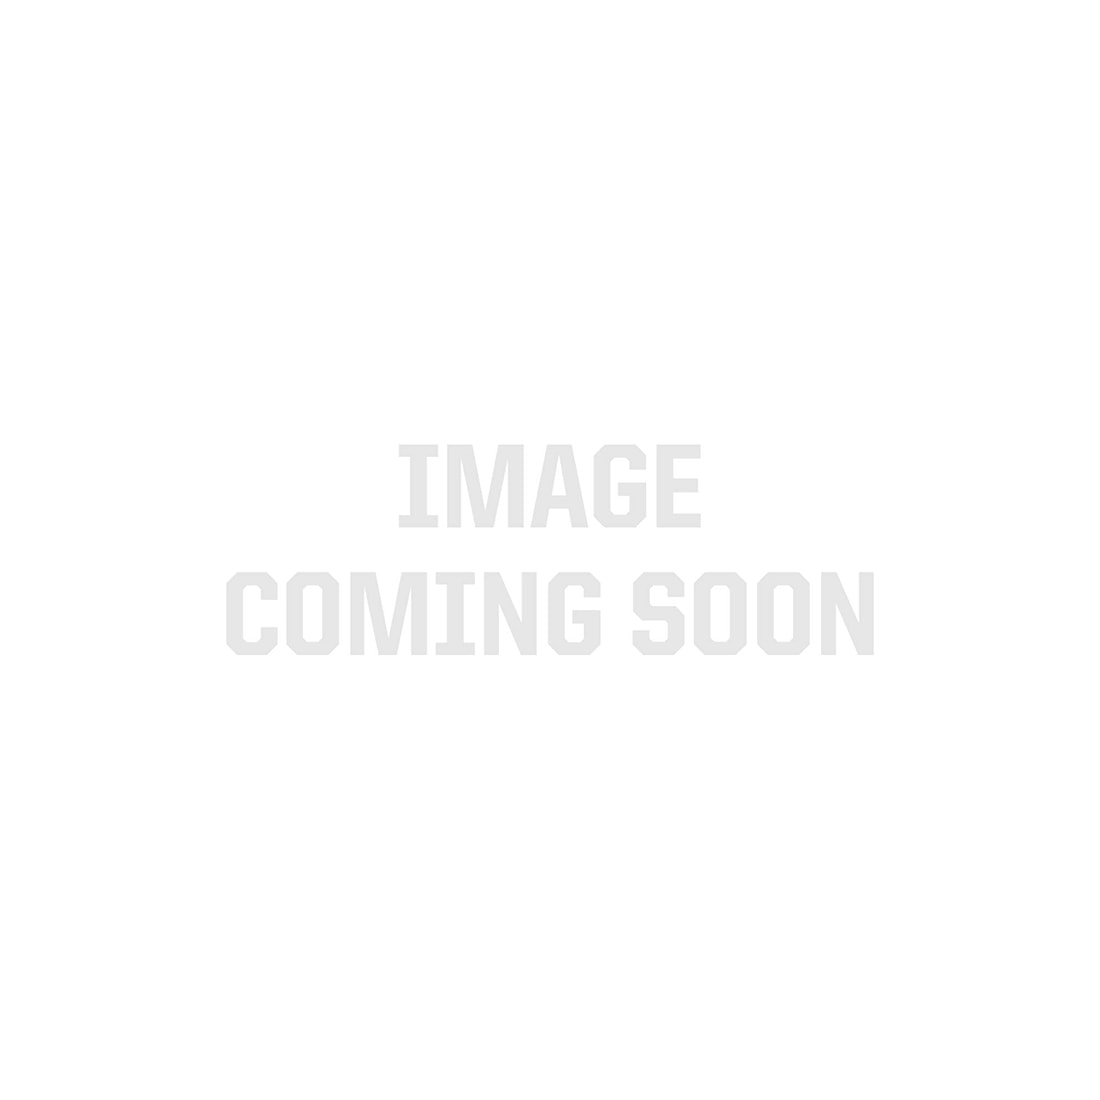 Waterproof Black Light UV 3528 Quad Row LED Strip Light, 450/m, 28mm wide, Sample Kit